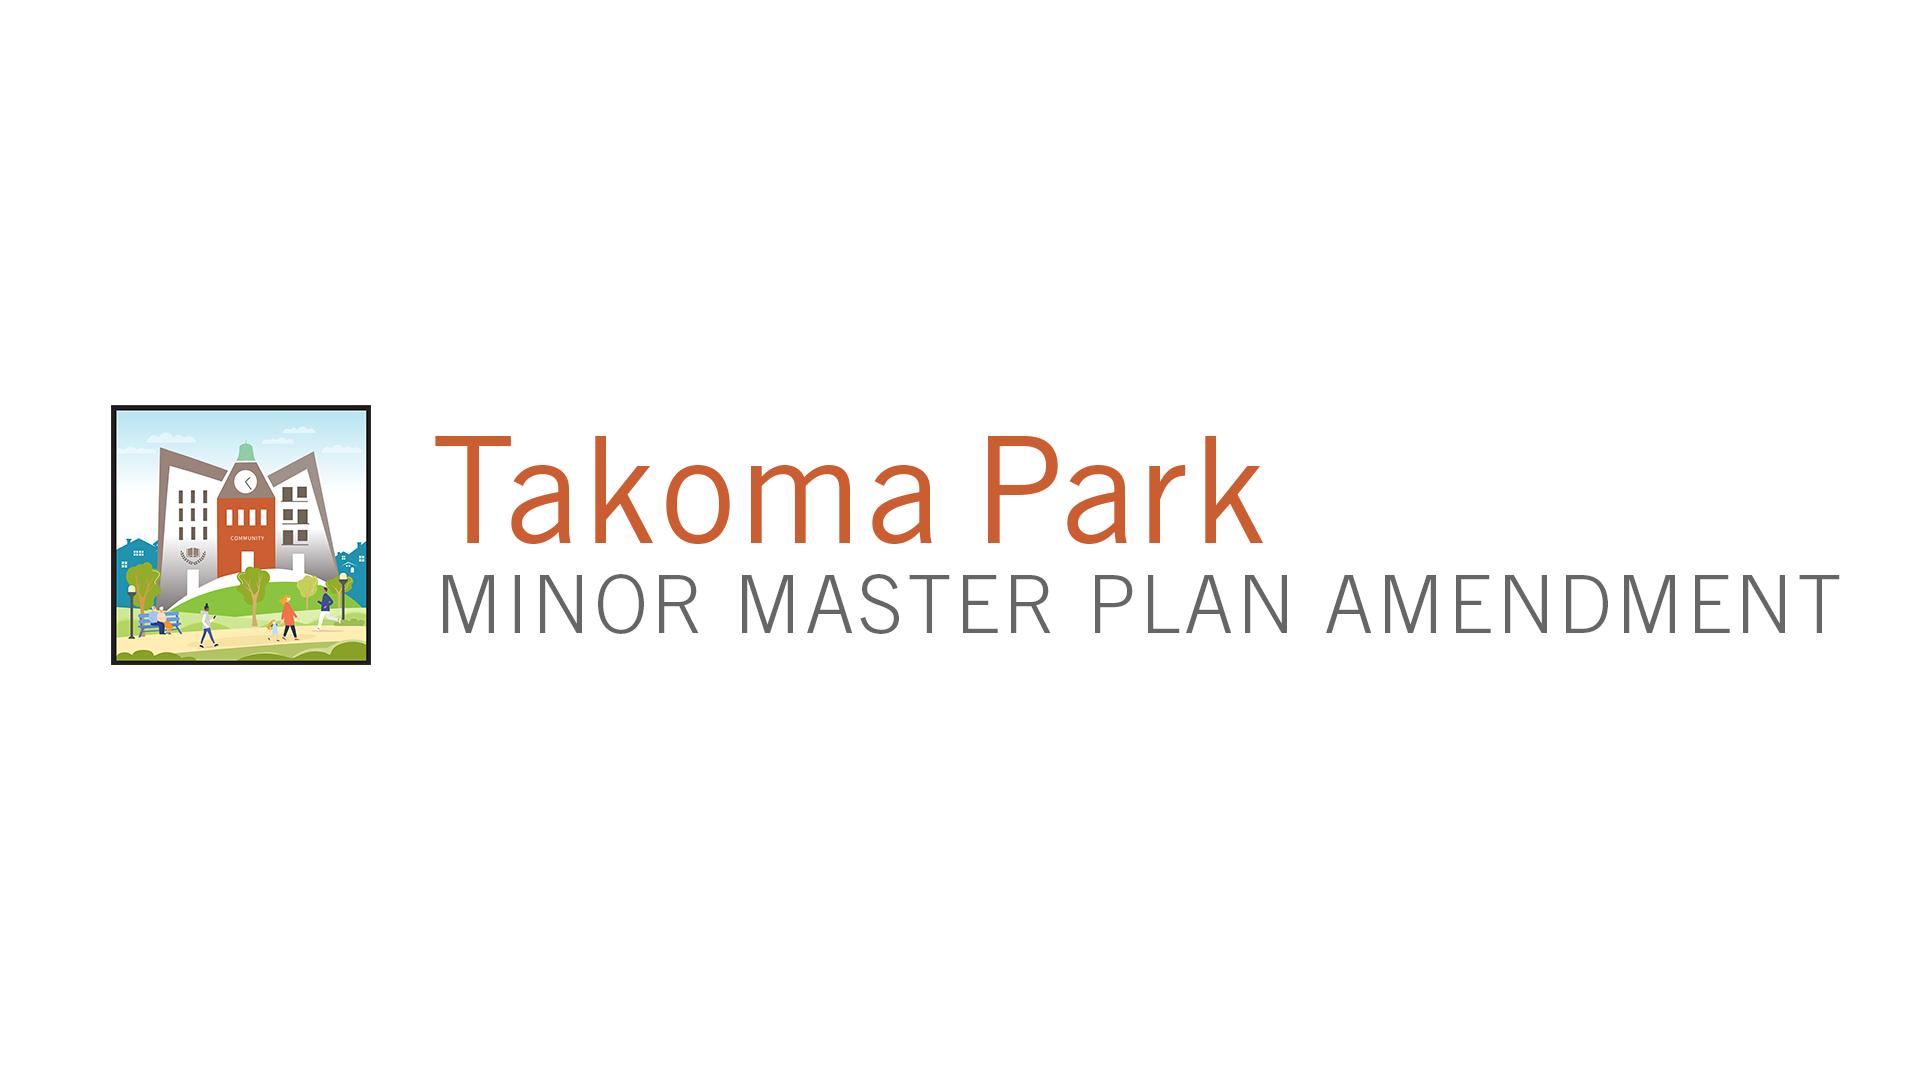 Takoma Park Minor Master Plan Amendment page